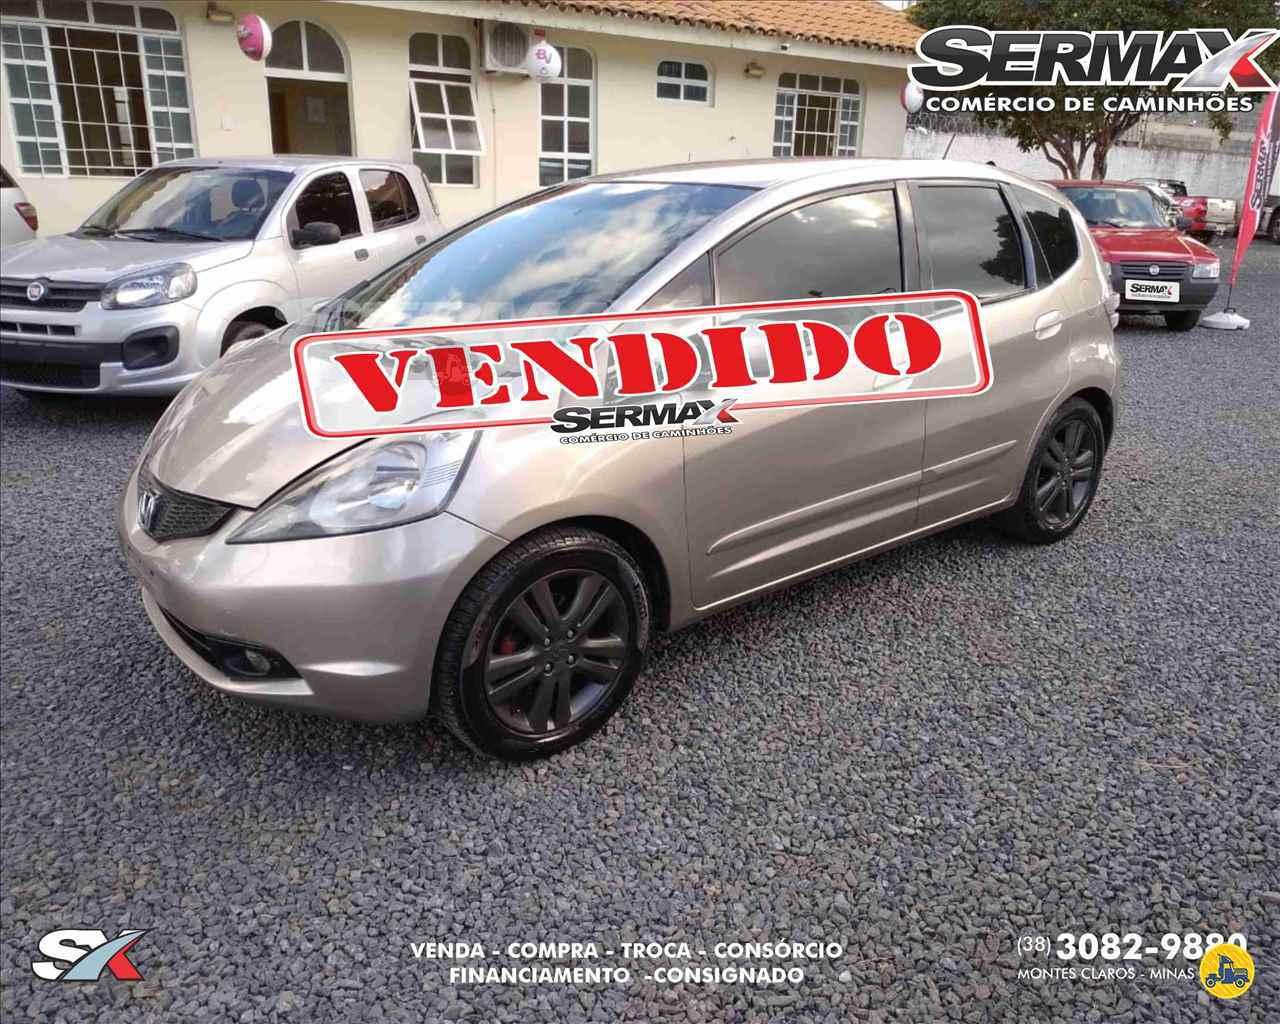 Fit 1.5 EXL de Sermax Caminhões - MONTES CLAROS/MG